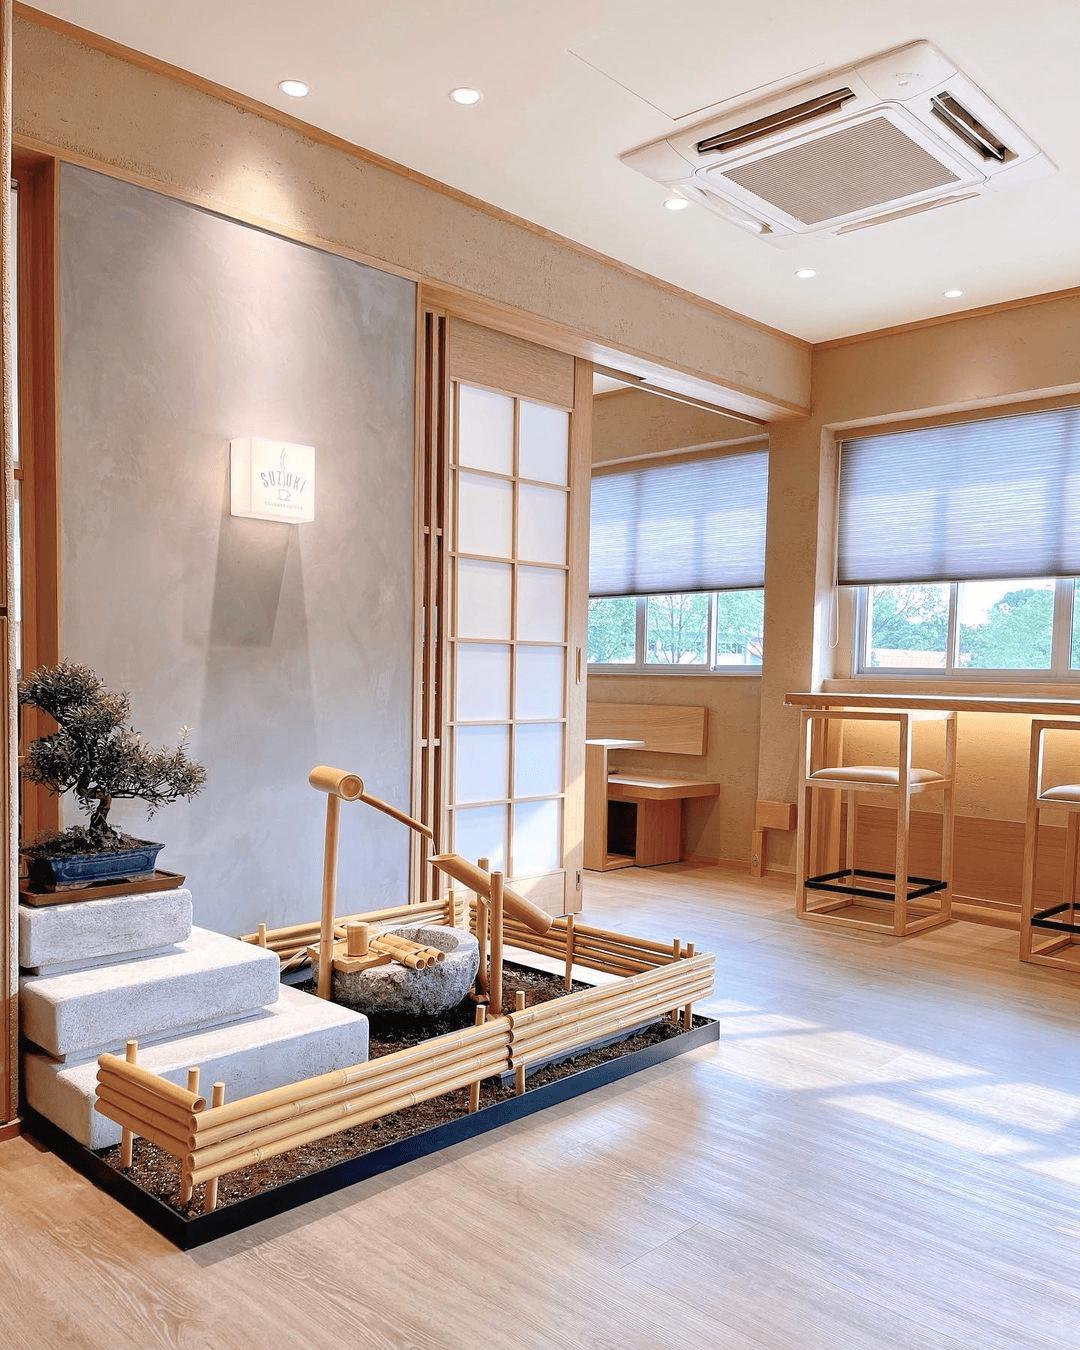 New Cafes And Restaurants June 2021 - Suzuki Gourmet Coffee